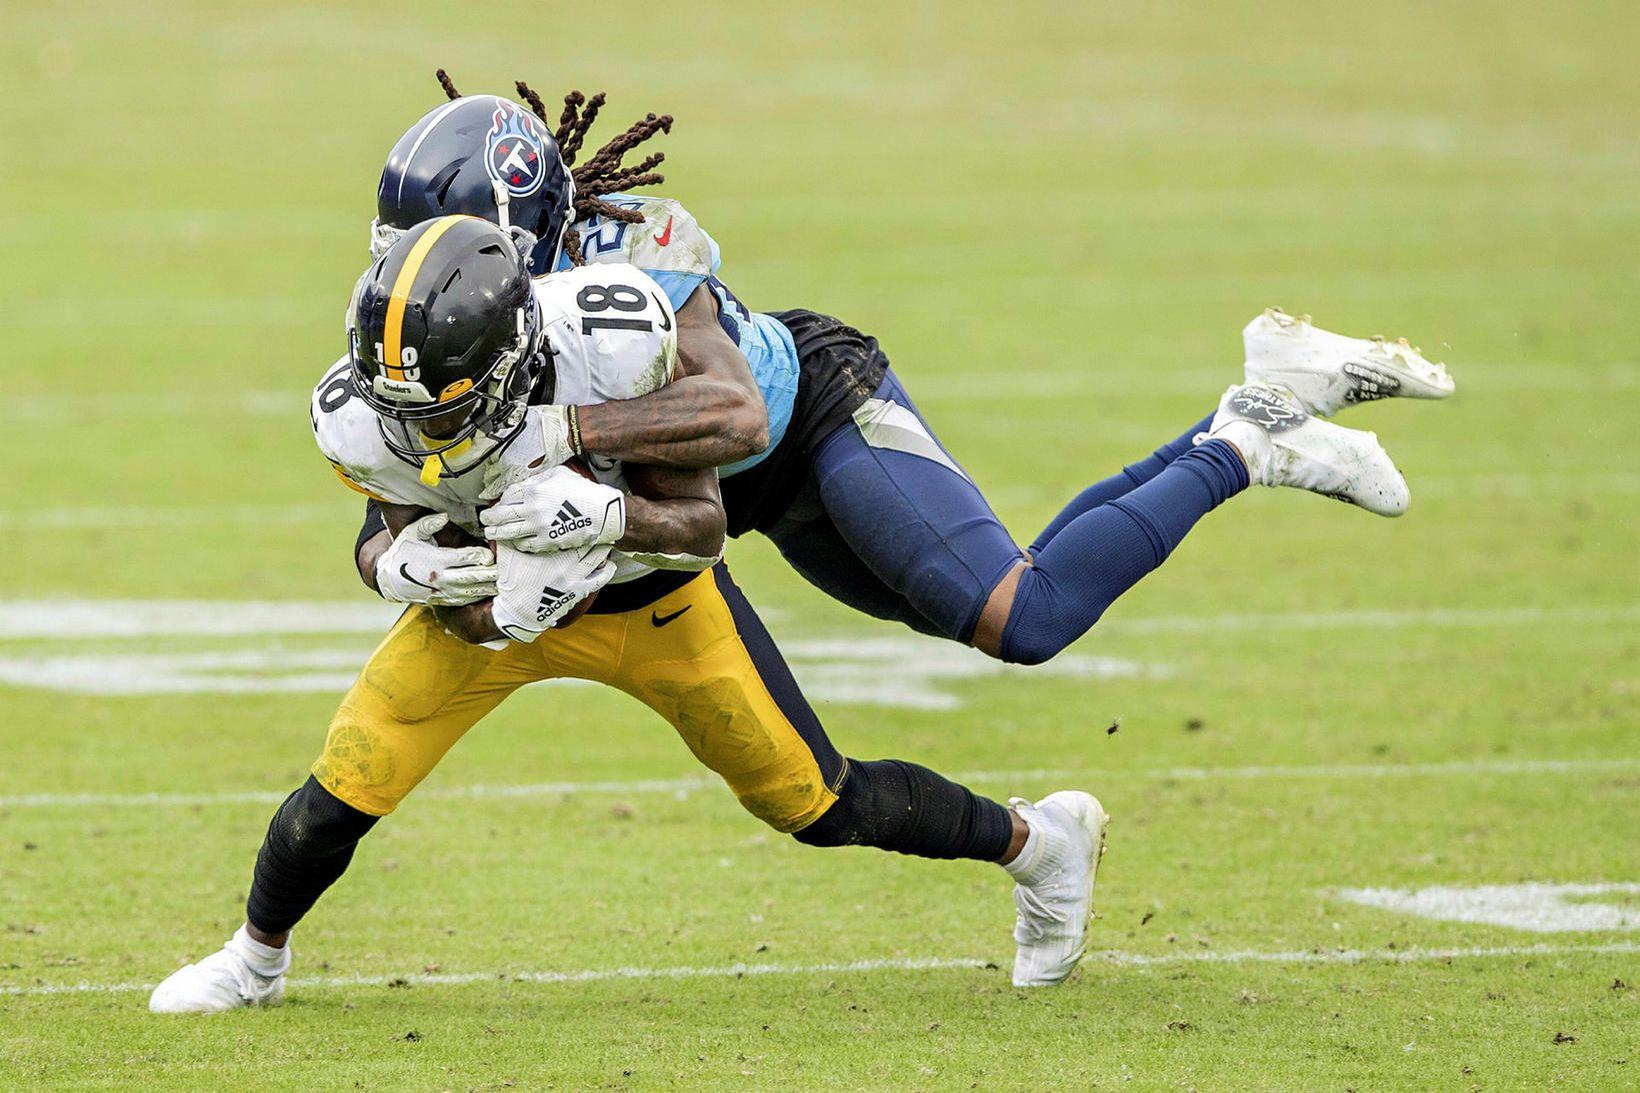 Diontae Johnson hjá Pittsburgh Steelers skýlir boltanum en Tye Smith …